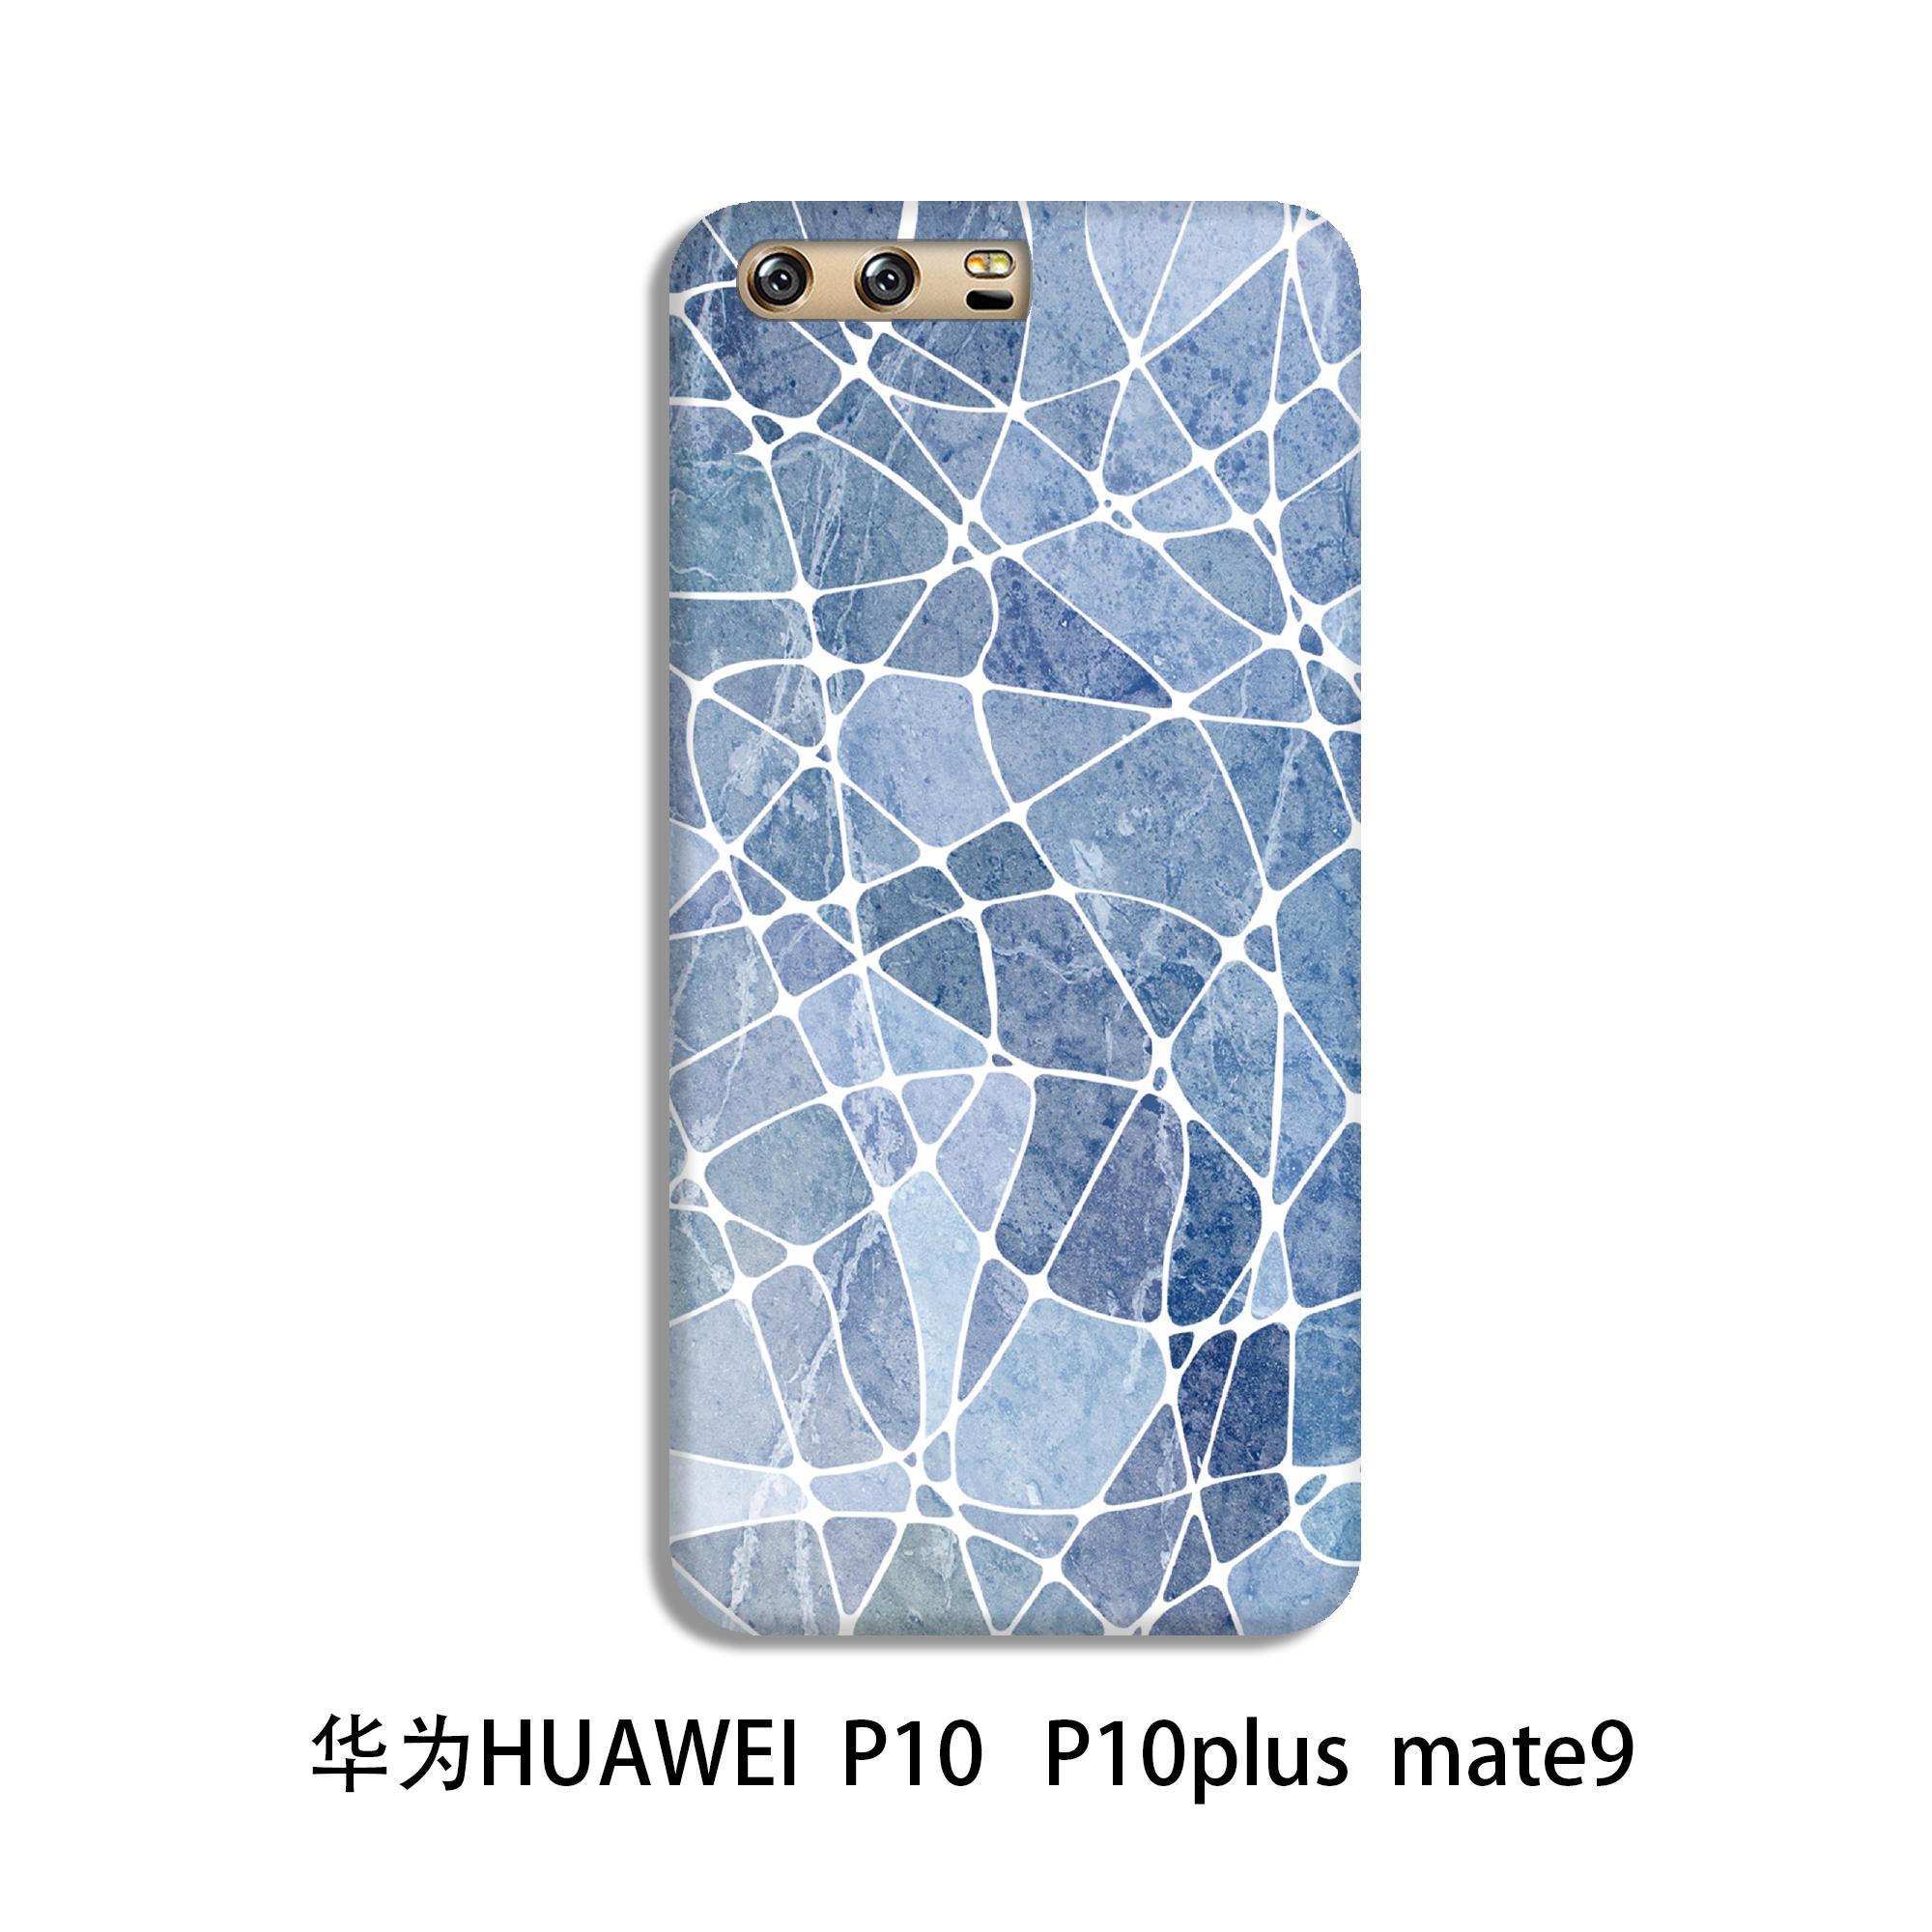 Padang Gurun Selubung Ponsel Nova2plusp9/P10Mate9/V9 Marmer